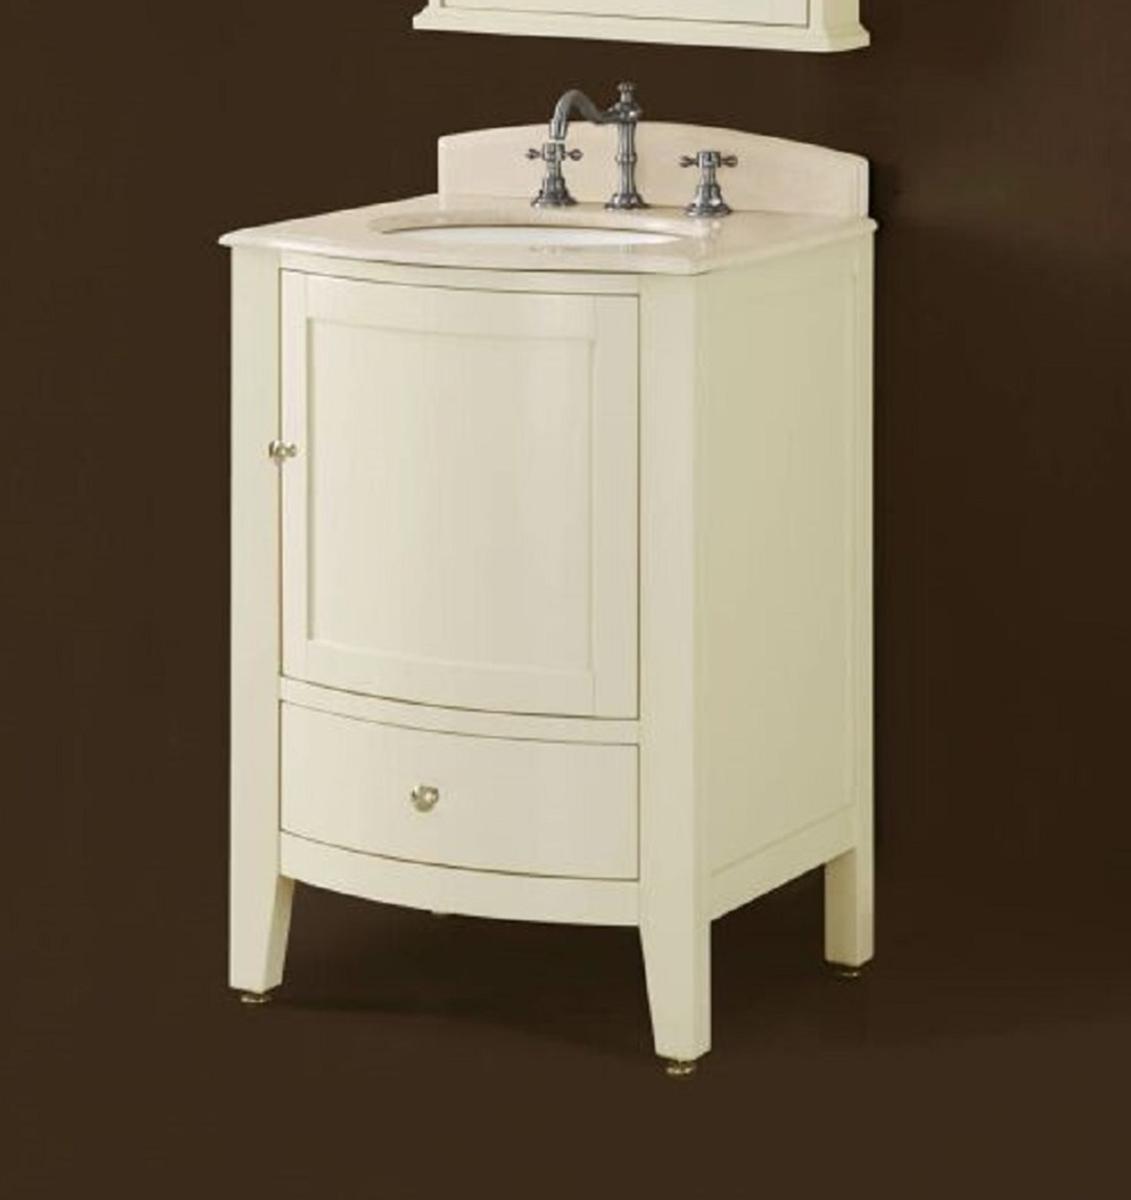 Chelsea Home Loft 24-inch Vanity - Ivory